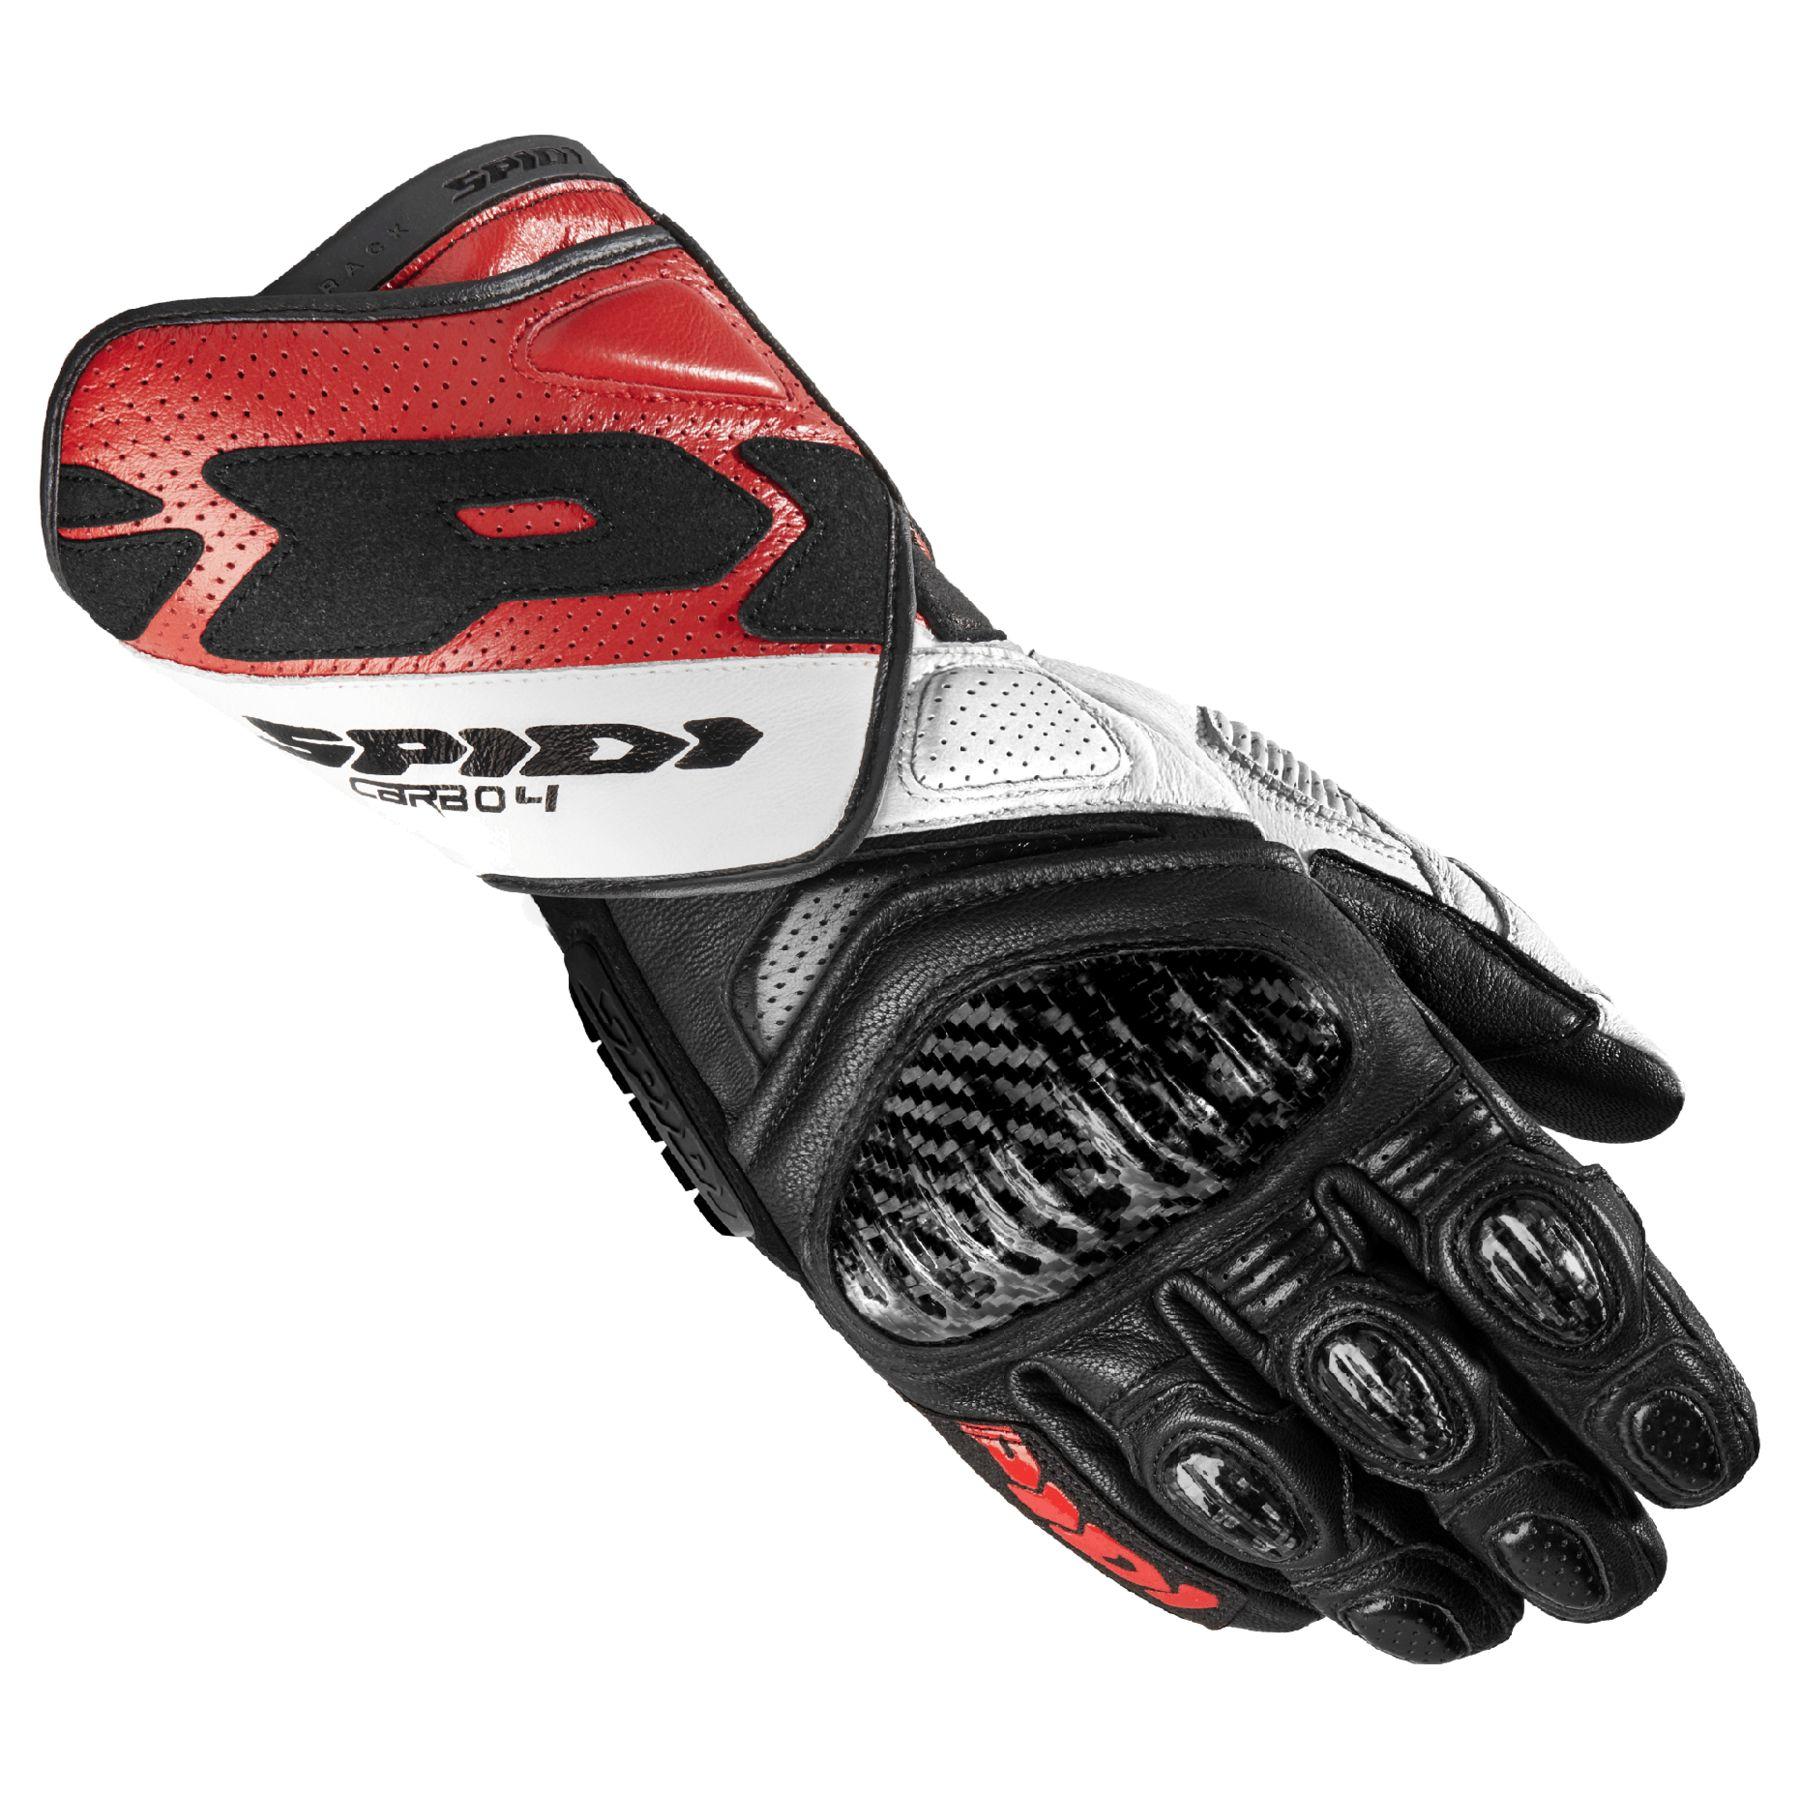 Spidi STR-2 Street Riding Gloves SMALL Black Silver Brand New